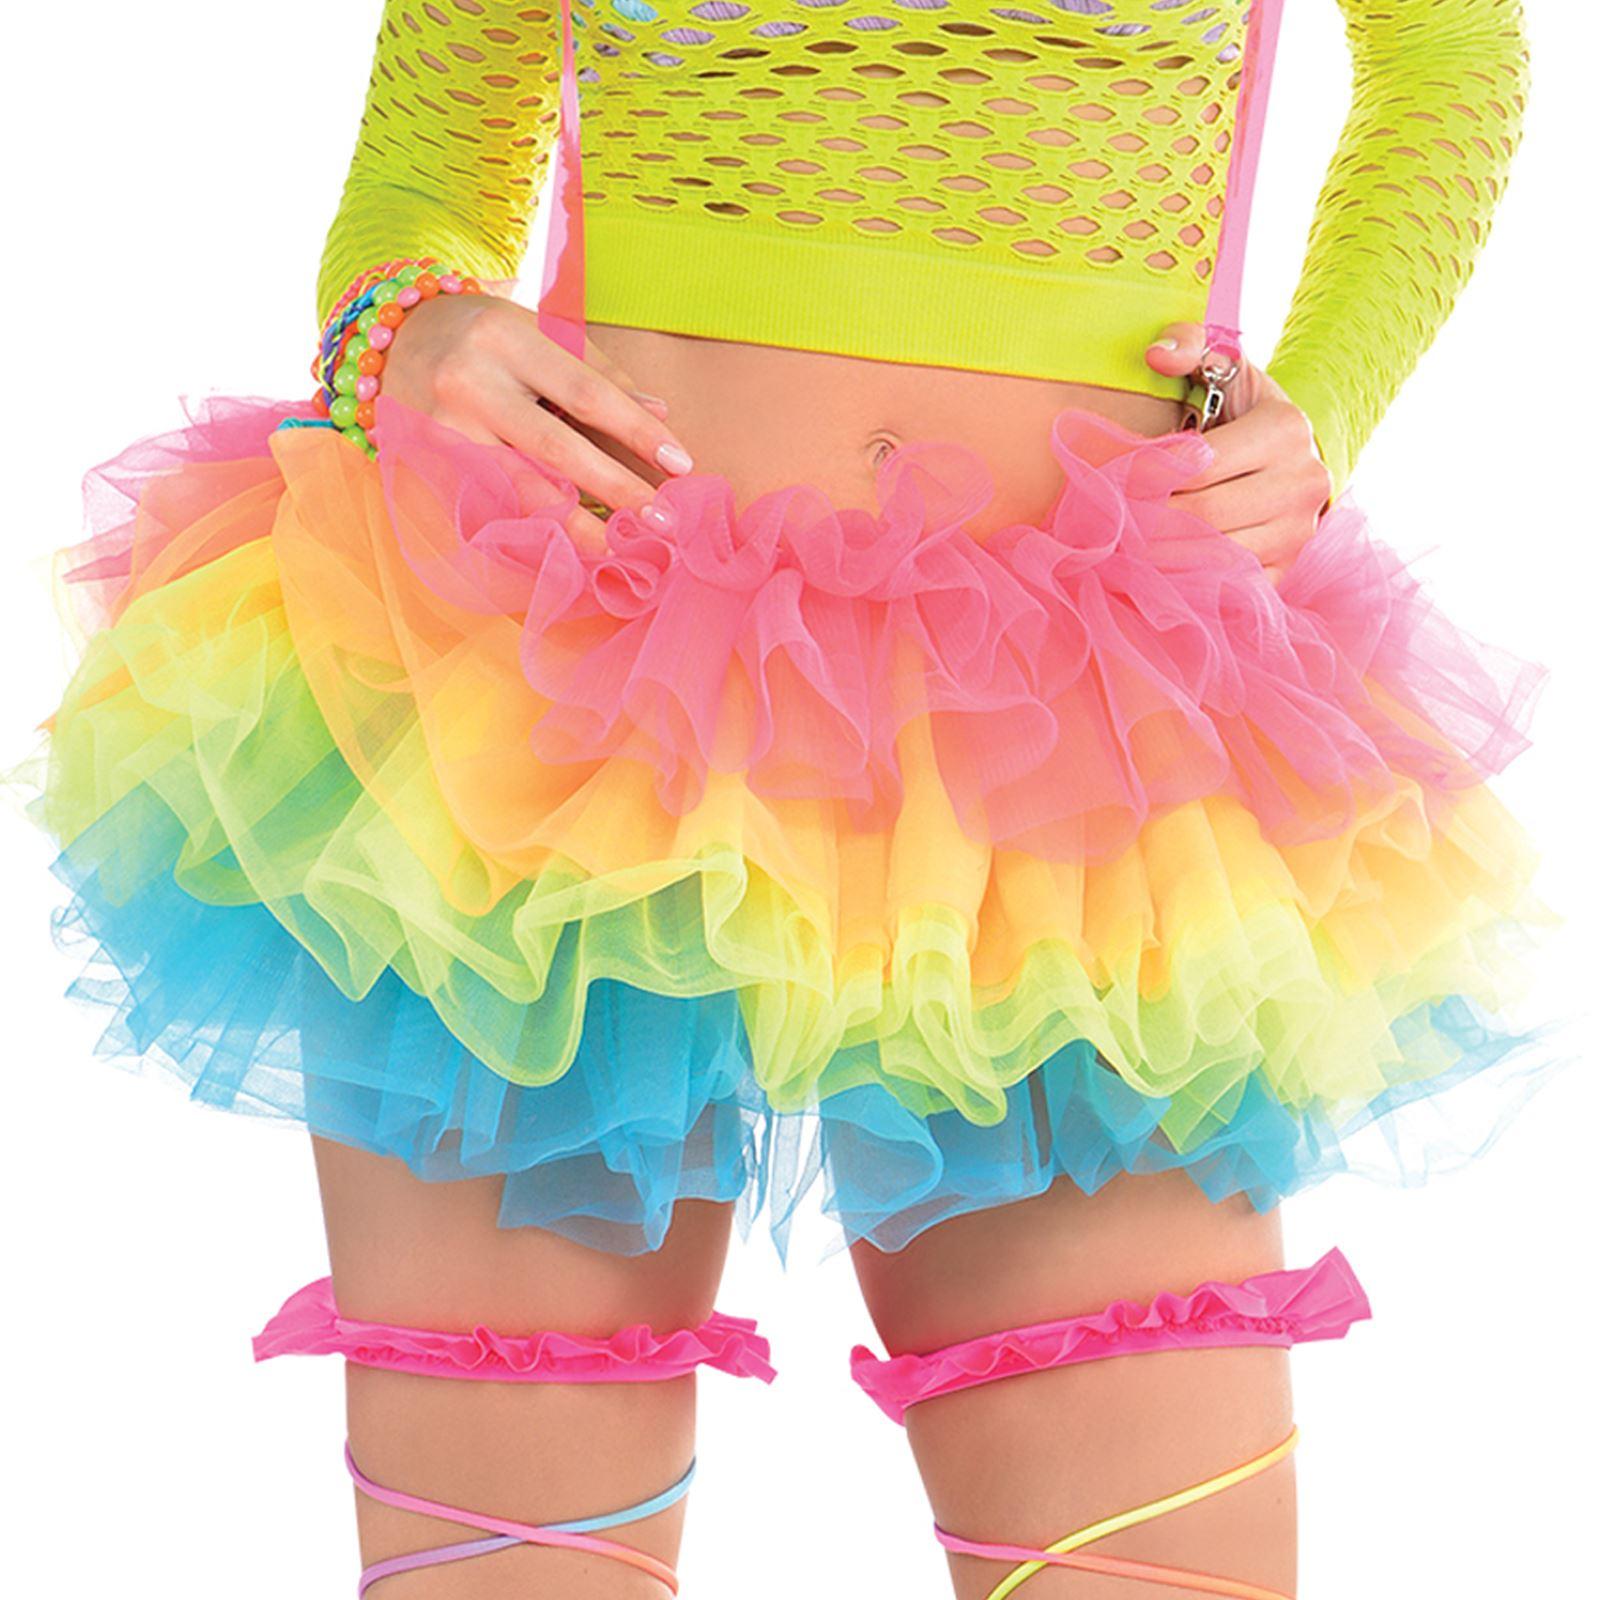 Rainbow adult cabaret